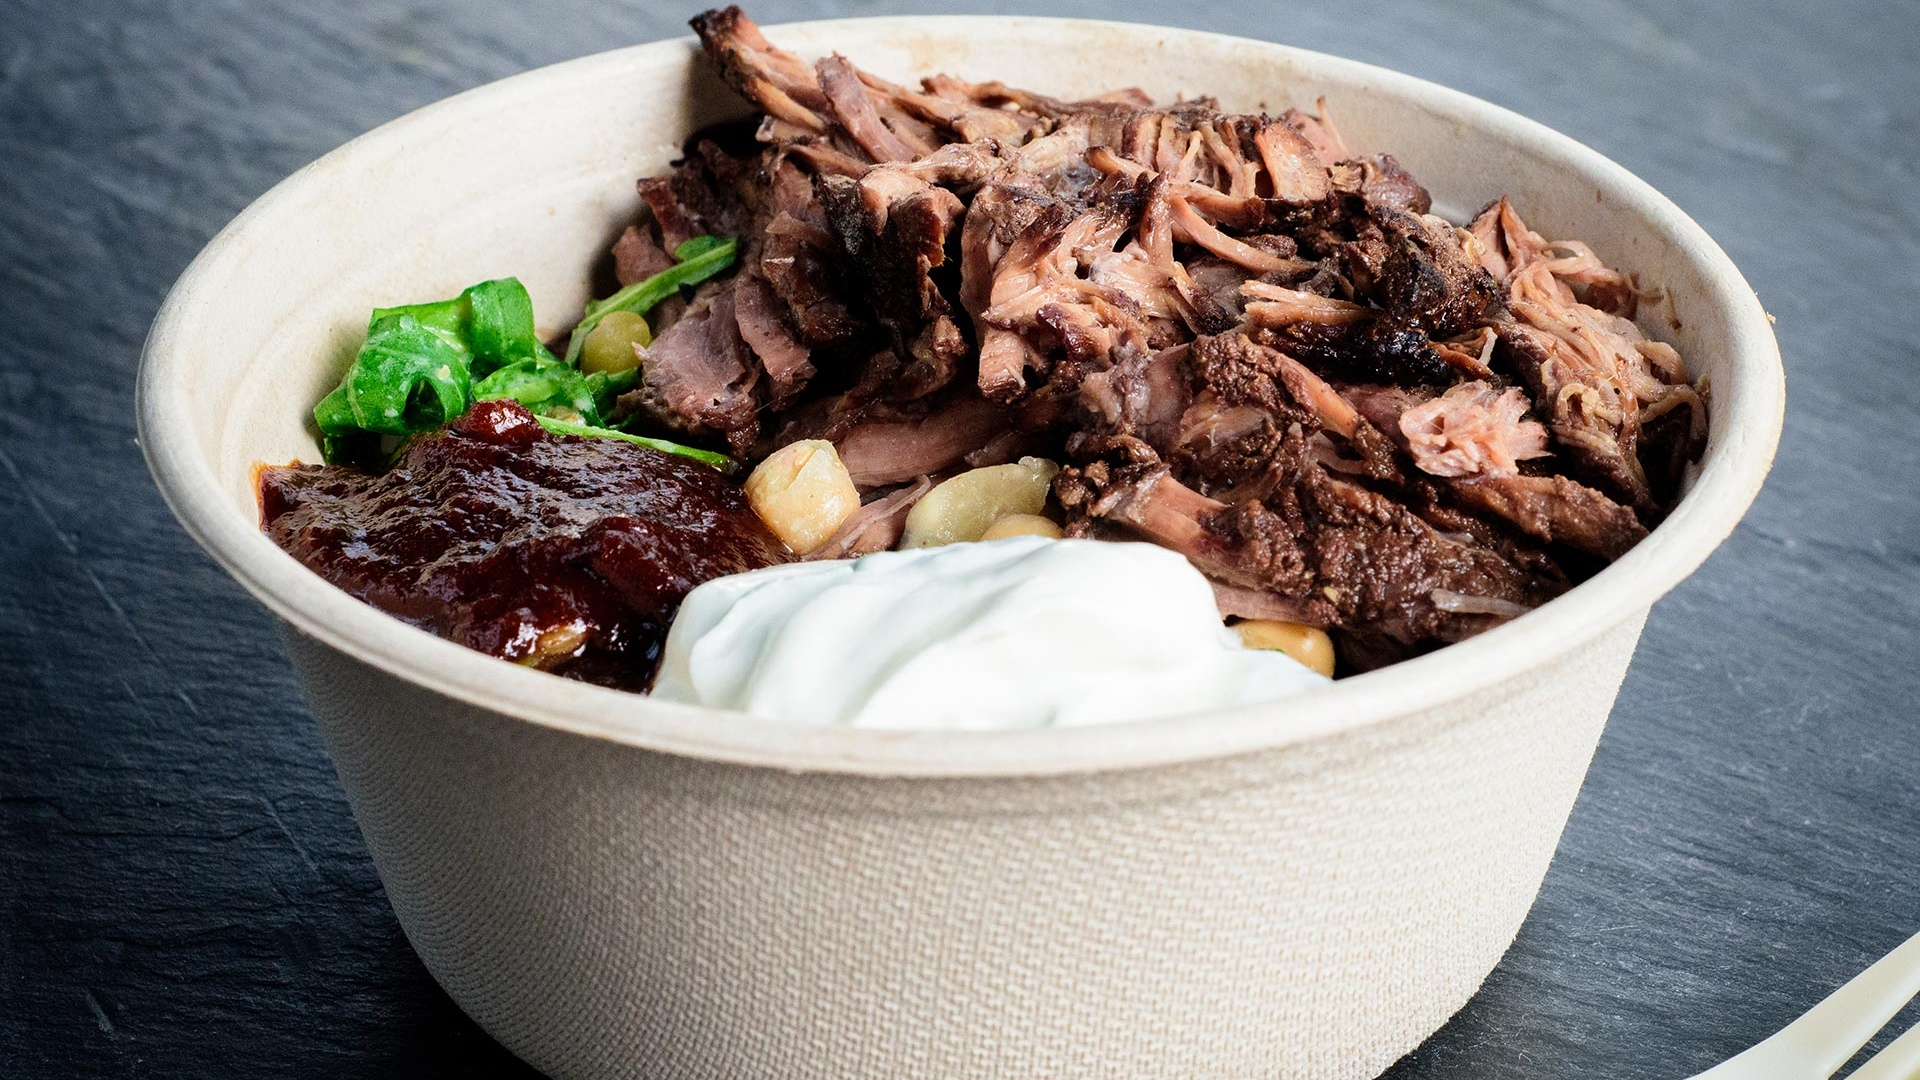 Gourmet Goat's slow-roast veal